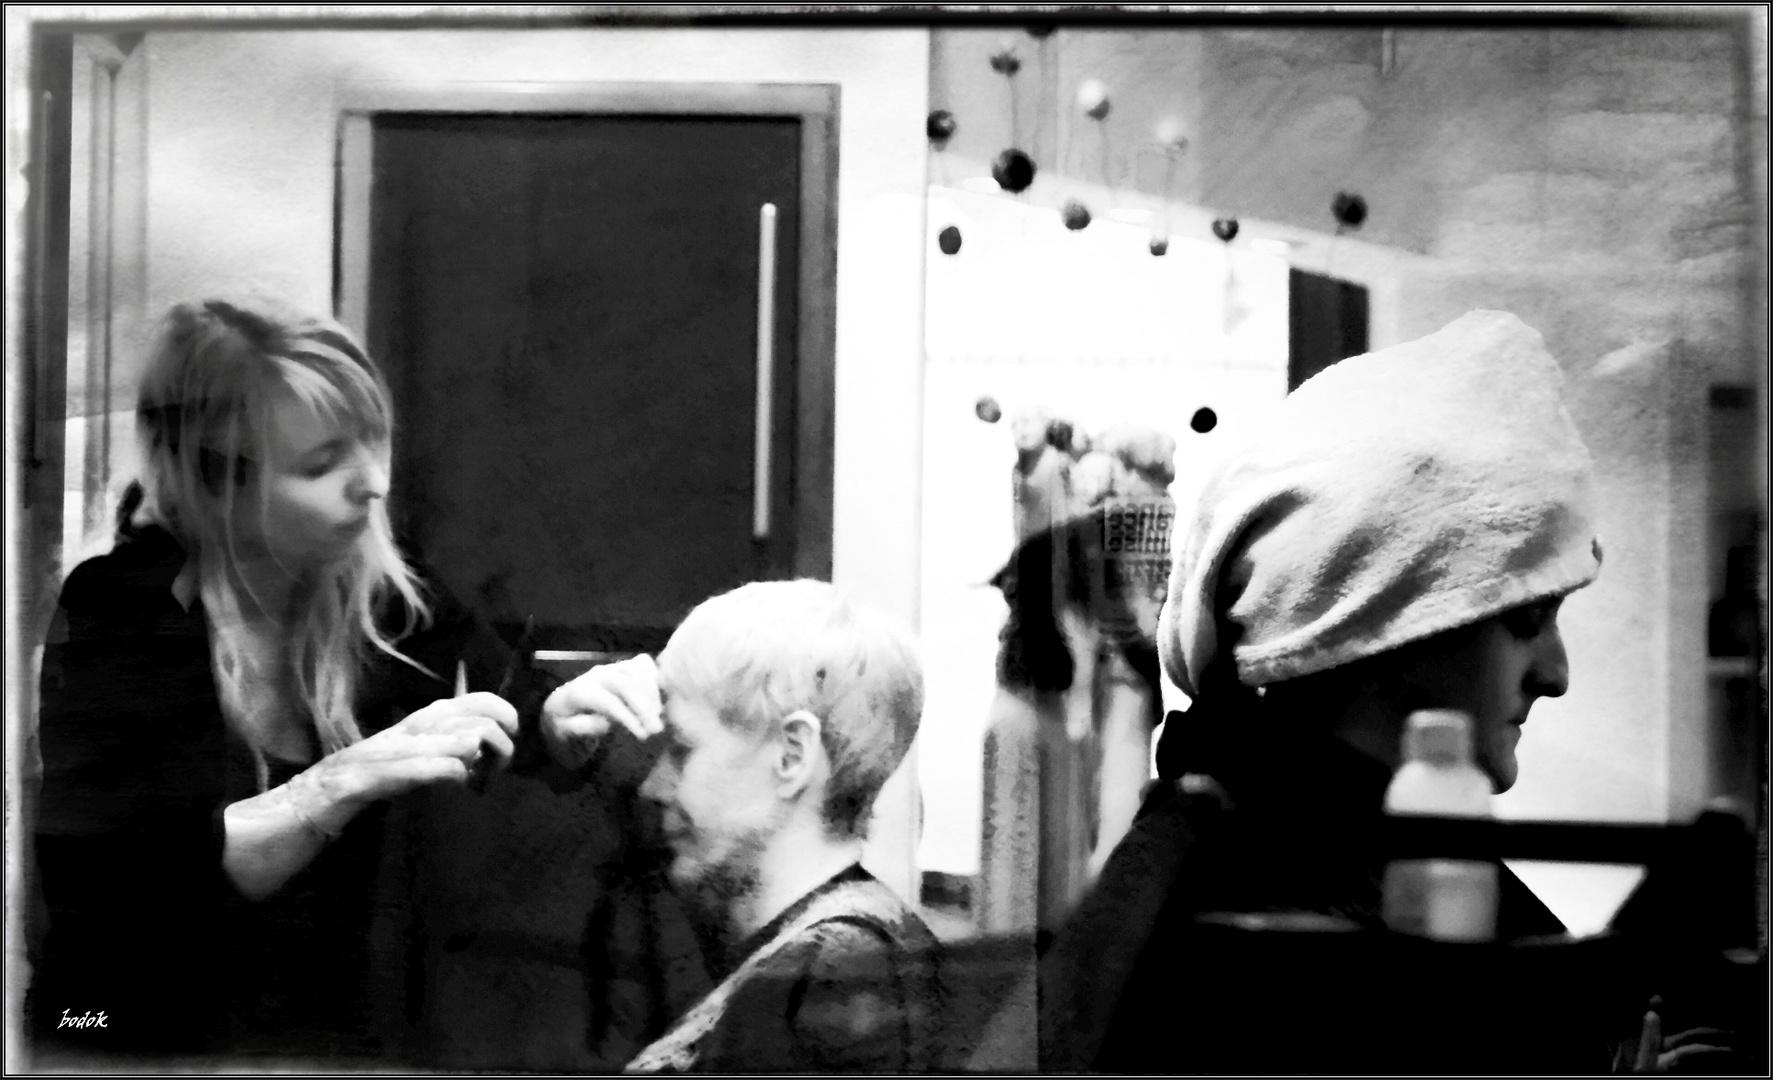 Le Frisur Foto Bild Street Spezial Dokumentation Bilder Auf